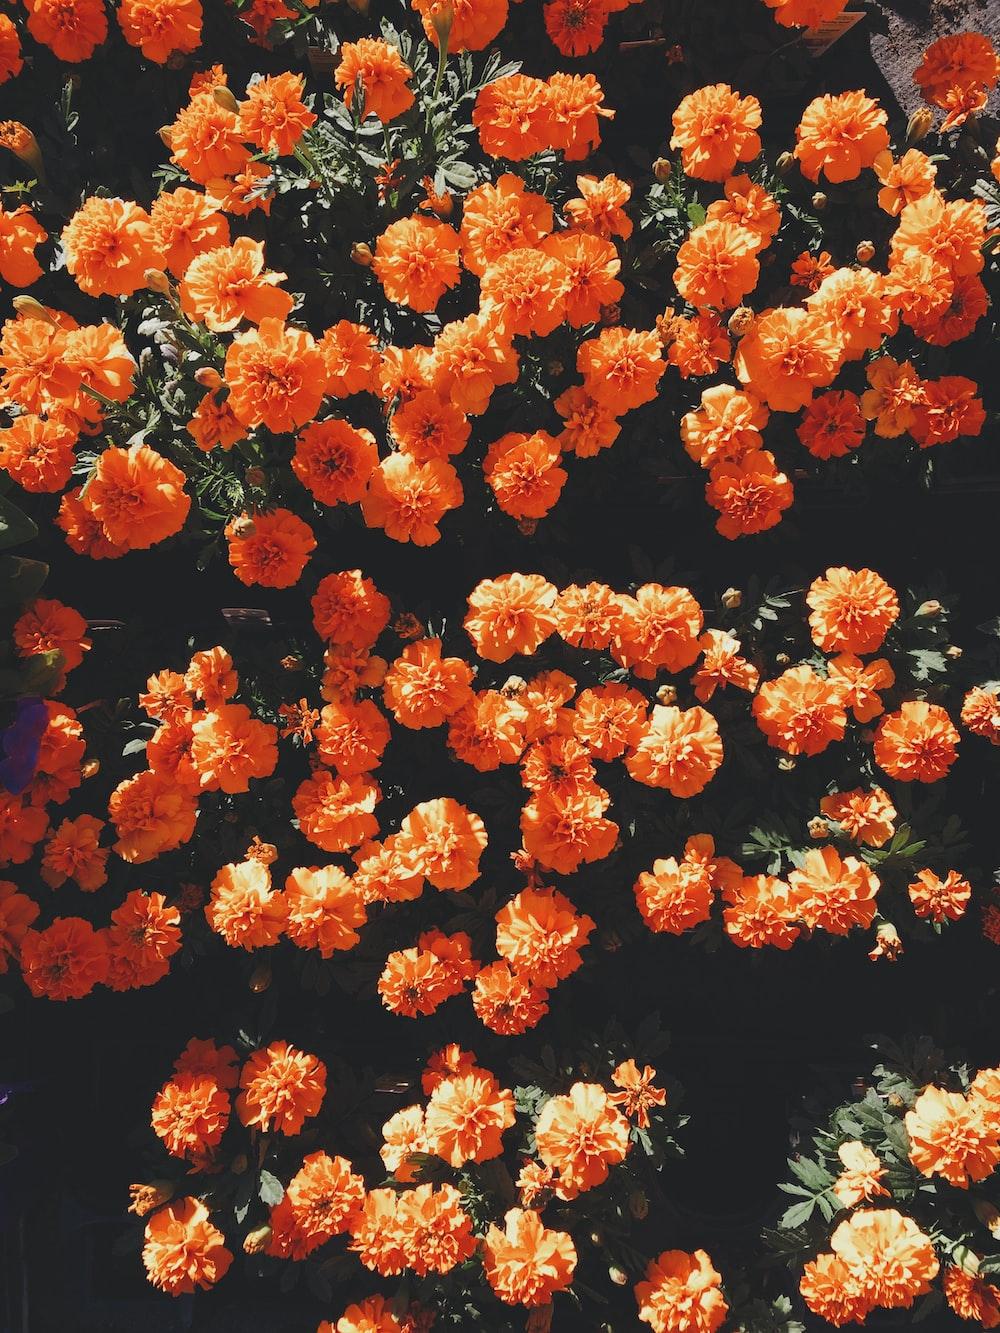 blooming orange petaled flowers at daytime